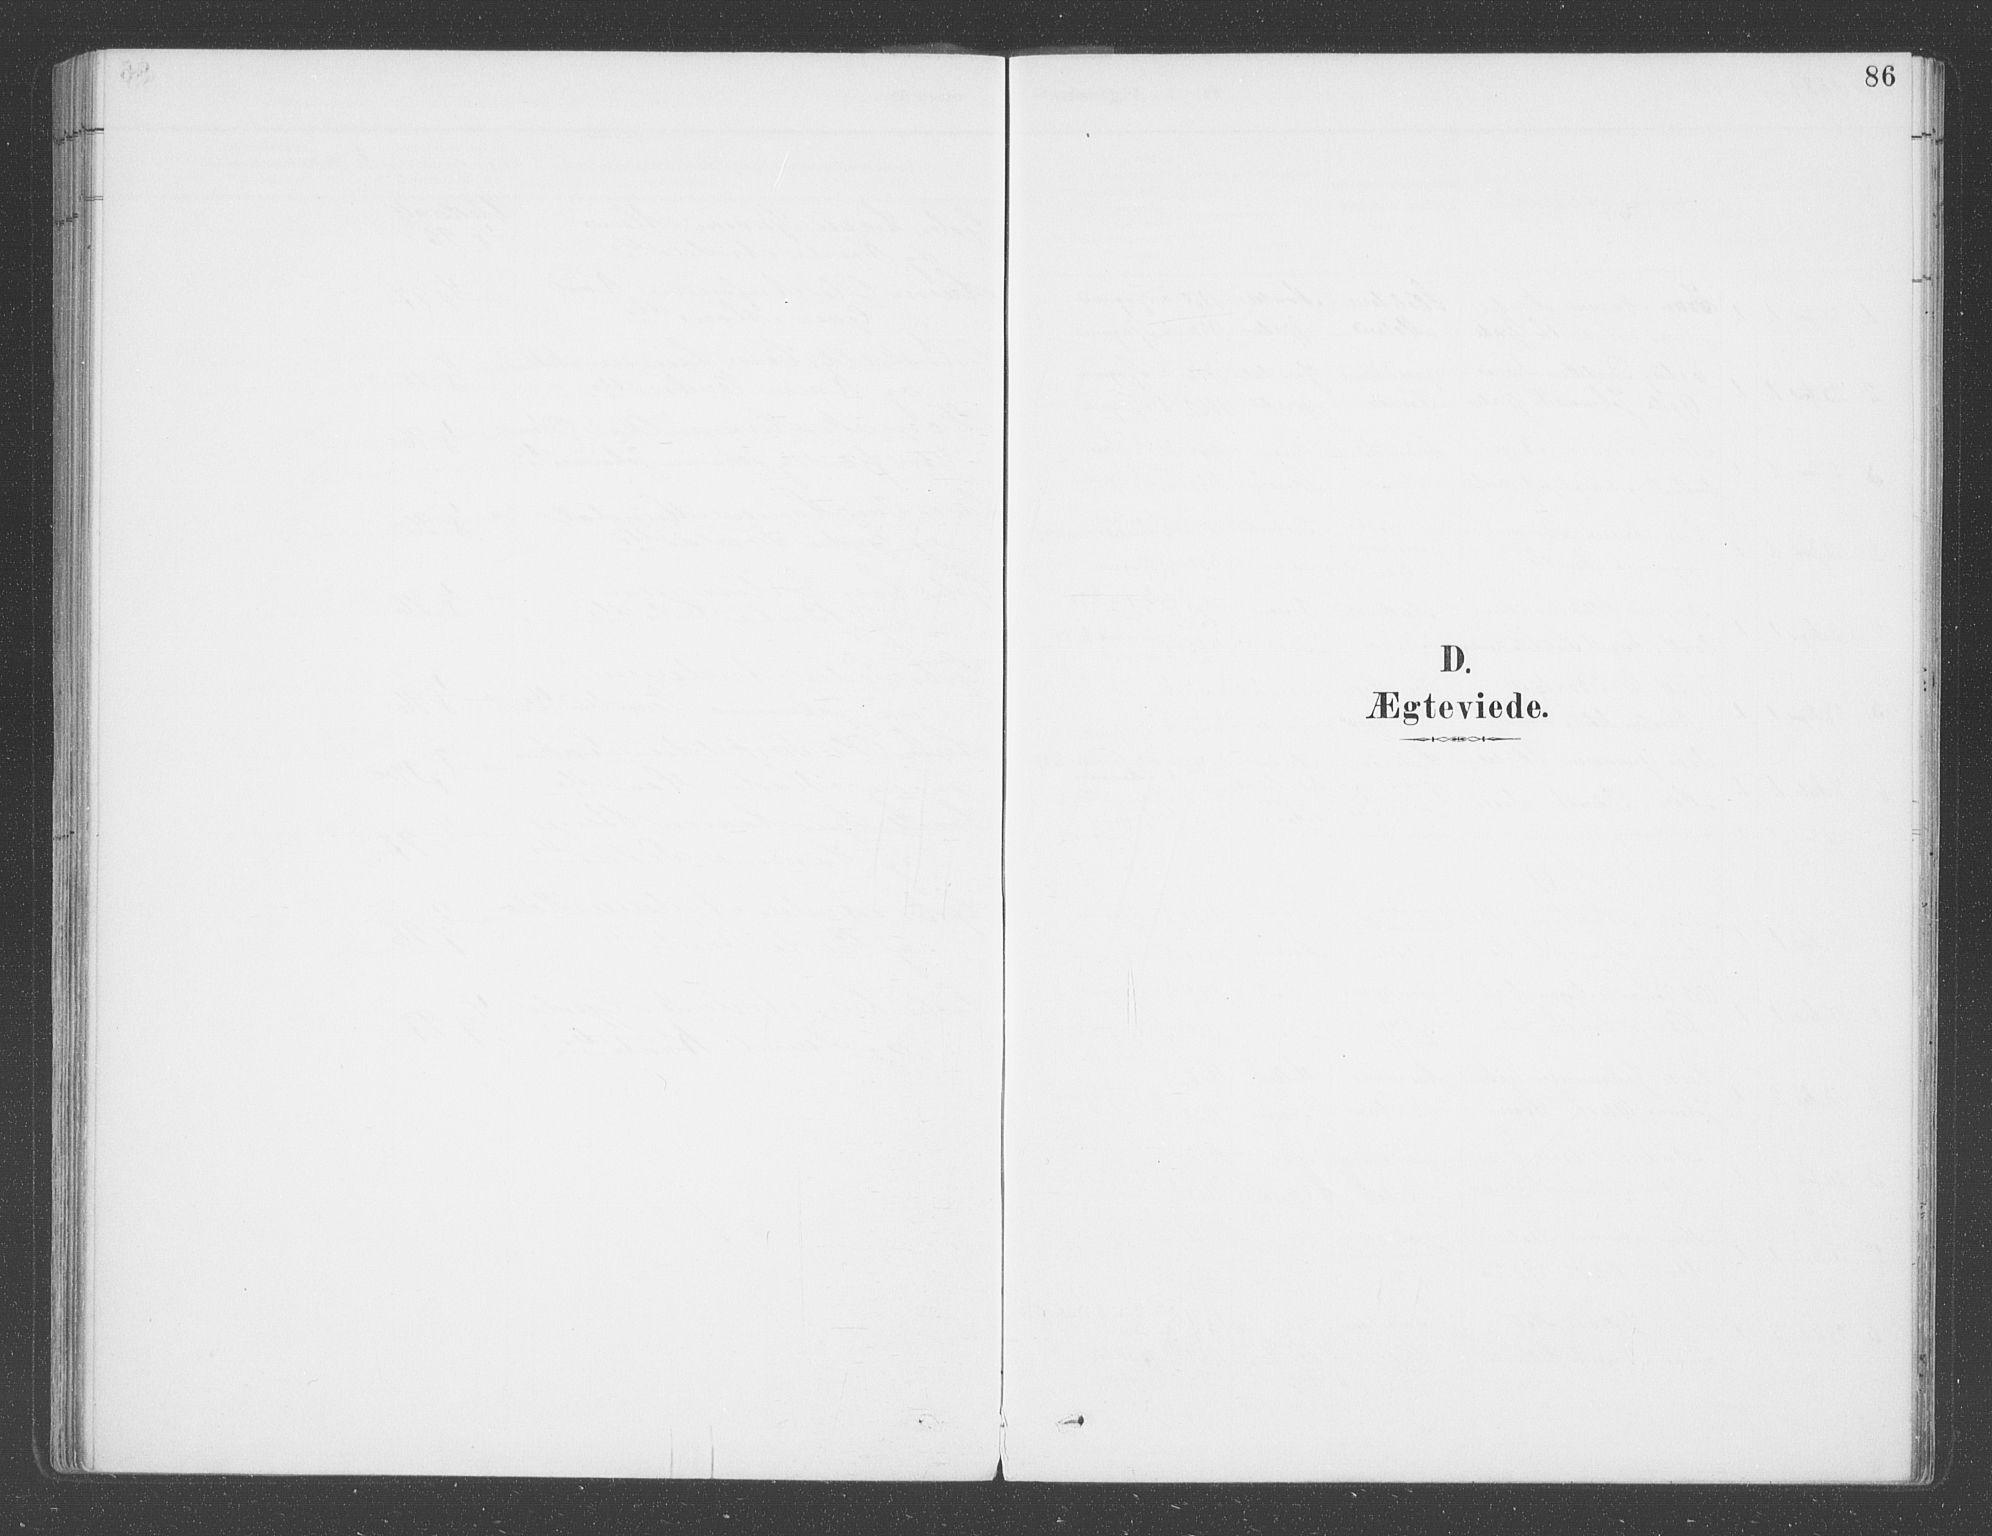 SAB, Balestrand sokneprestembete, H/Haa/Haab/L0001: Ministerialbok nr. B  1, 1889-1910, s. 86